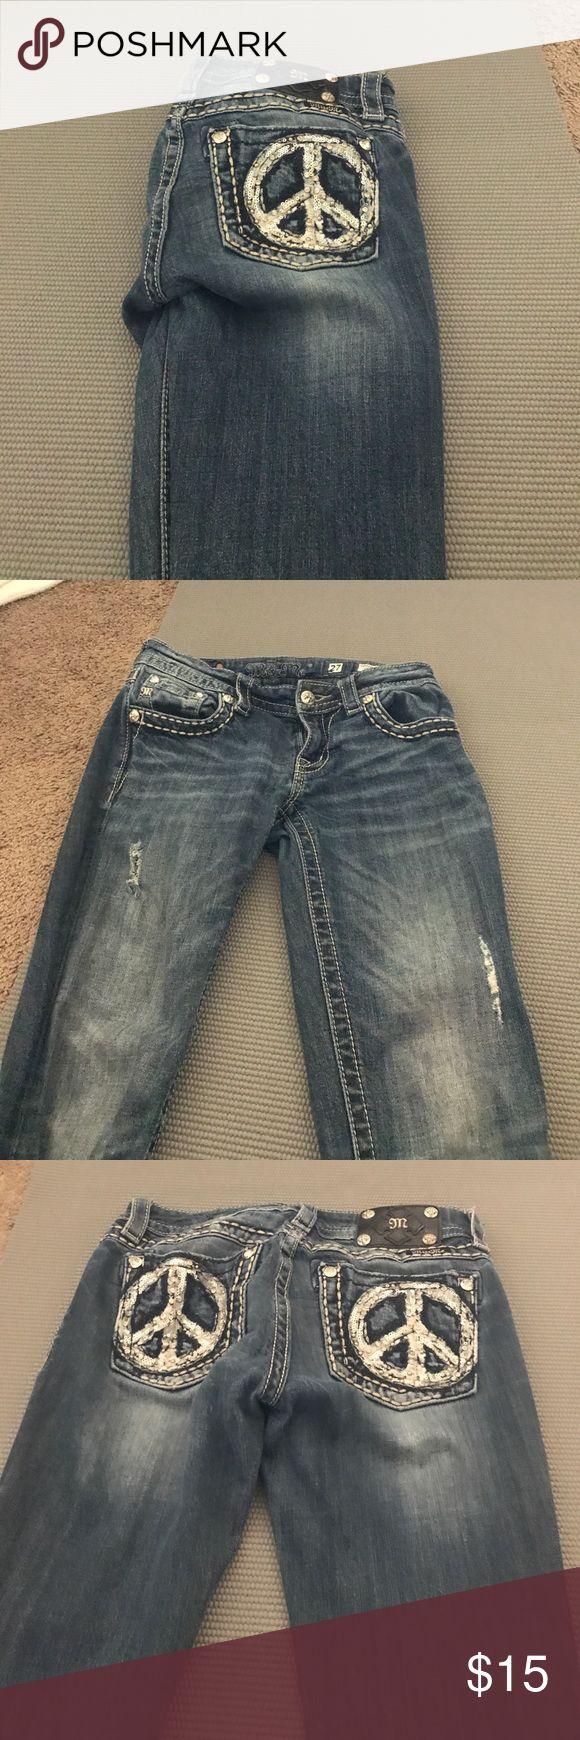 Miss Me skinny jeans size 27 Dark wash Miss me Jeans size 27 great condition Miss Me Jeans Skinny